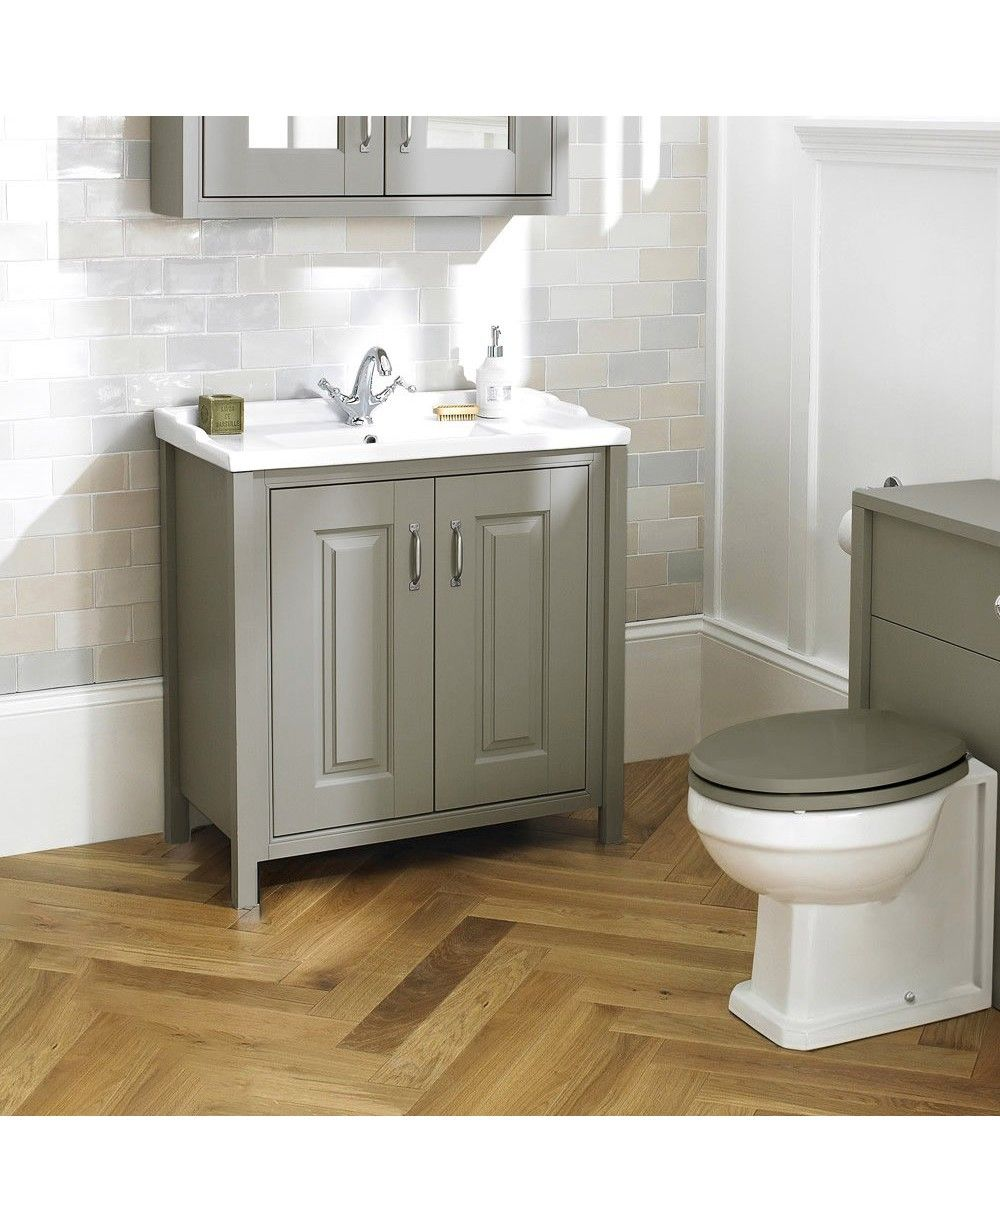 Braxton Stone Grey Traditional 800mm Freestanding 2 Door Vanity Unit Ceramic Basin Traditional Bathroom Traditional Bathroom Cabinets Traditional Bathroom Furniture